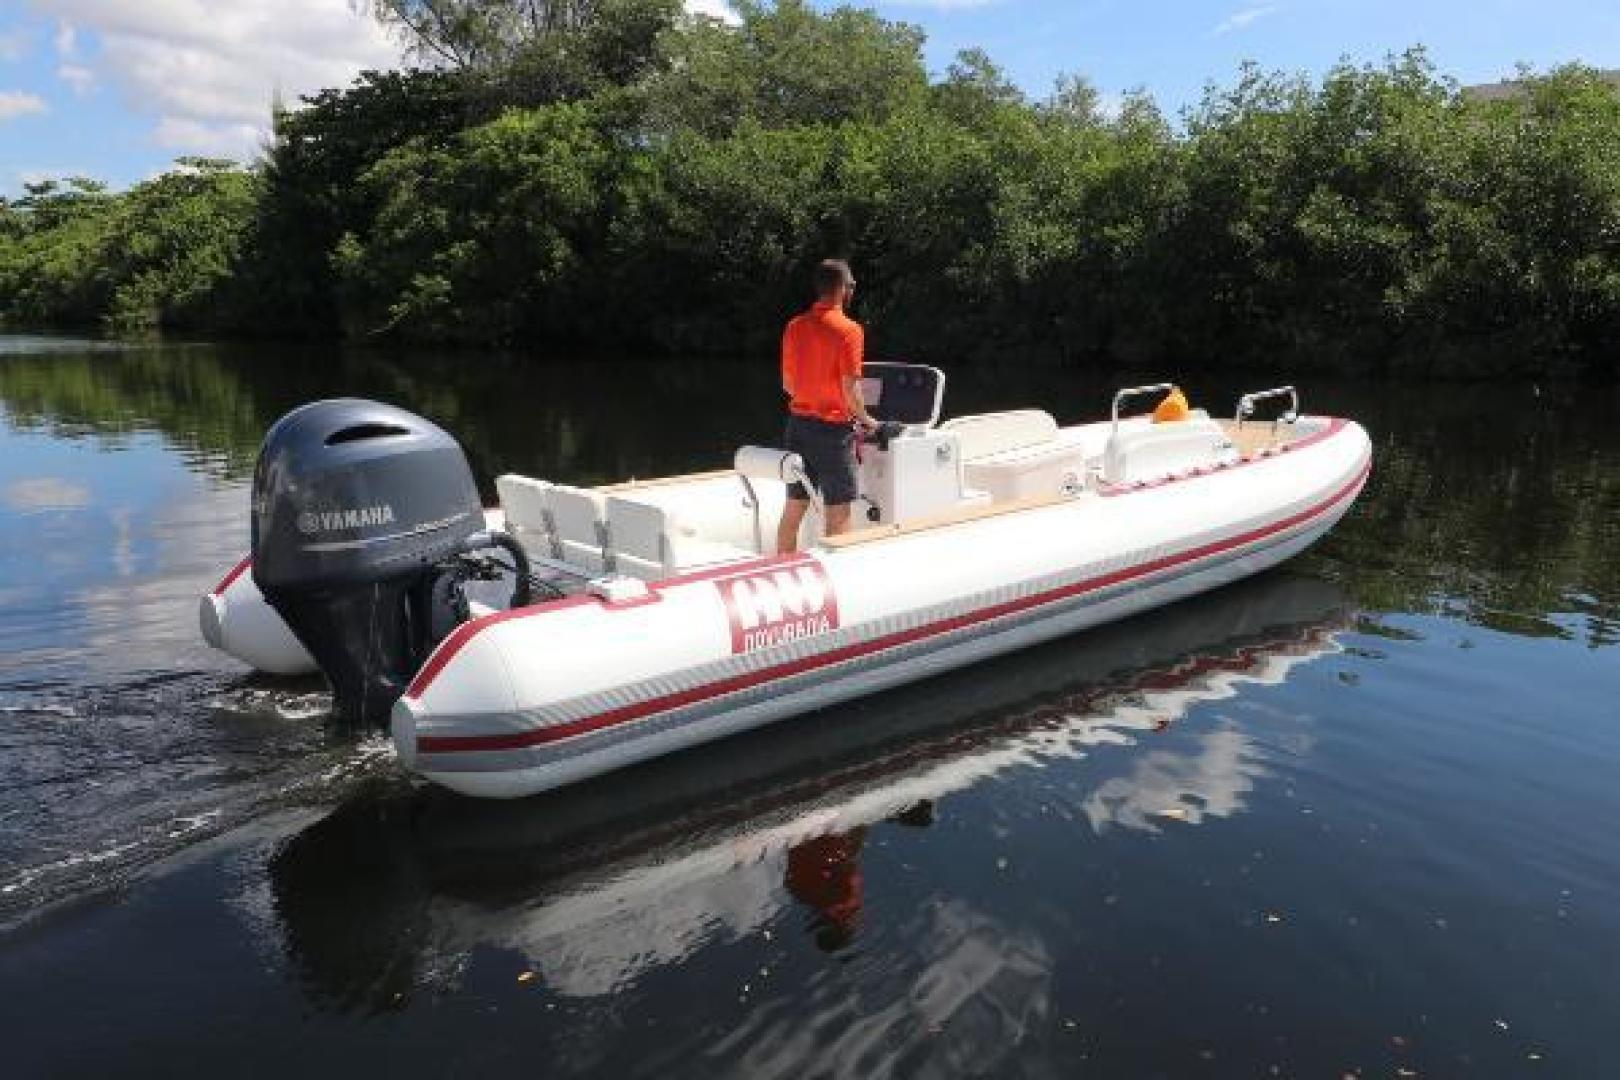 Novurania-Catamaran 24 2017-Novurania Catamaran 24 Fort Lauderdale-Florida-United States-1530847   Thumbnail